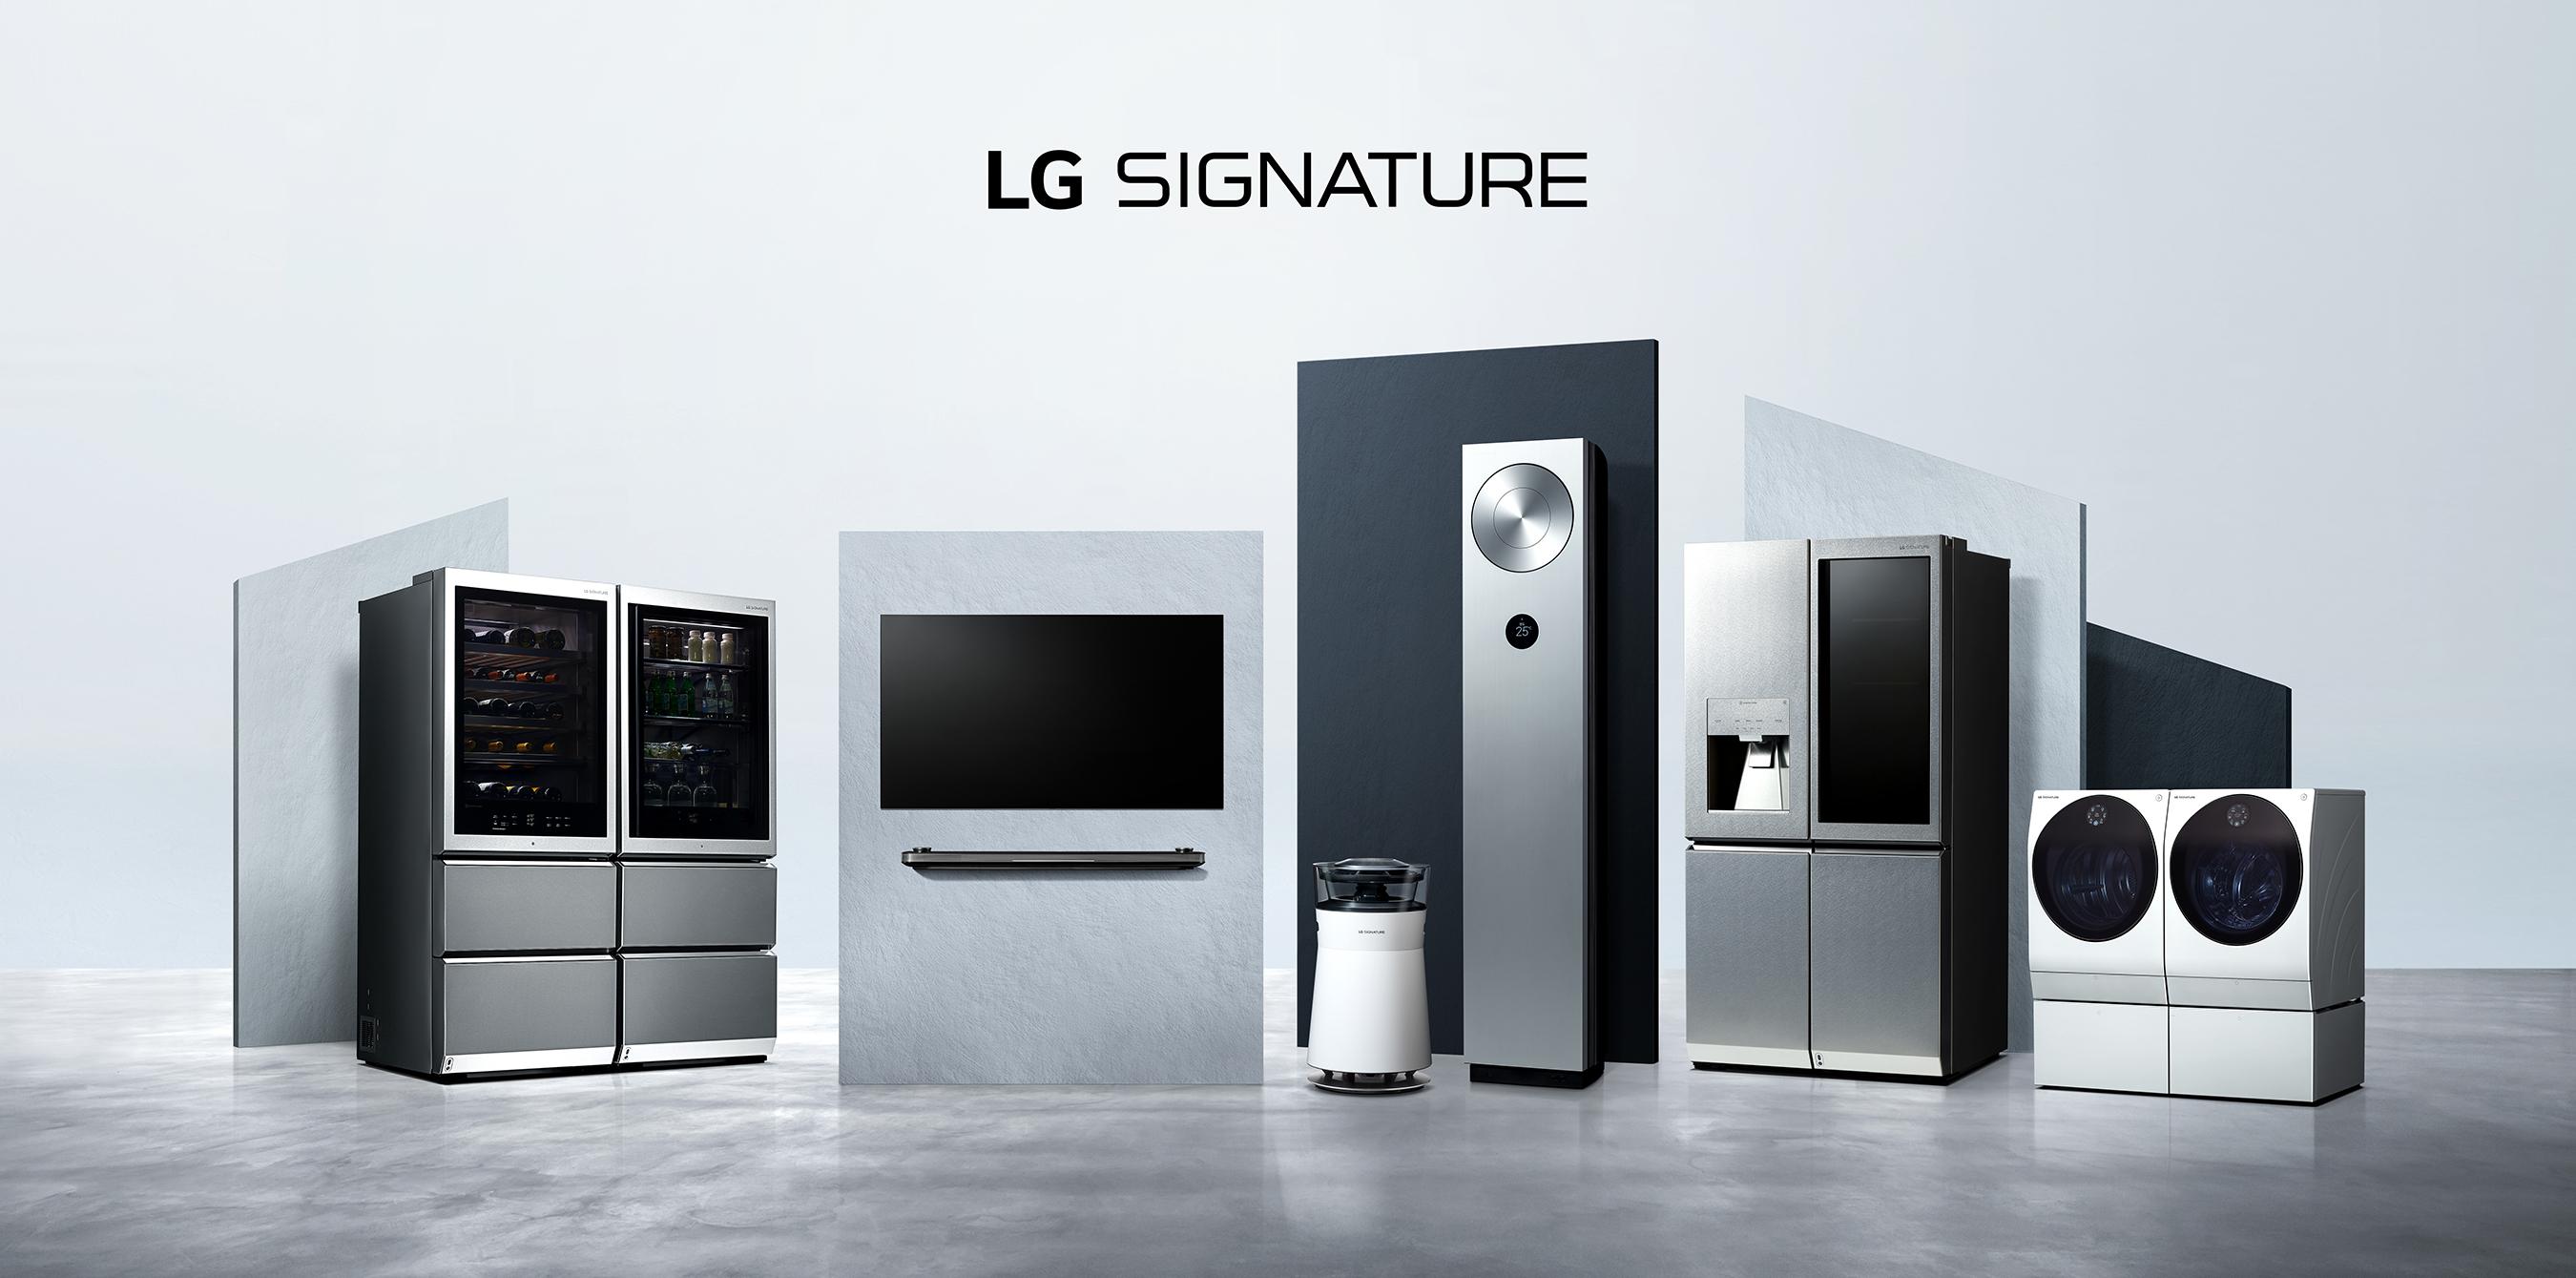 'LG 시그니처', 런던디자인페스티벌서 '예술과 기술의 조화' 알린다